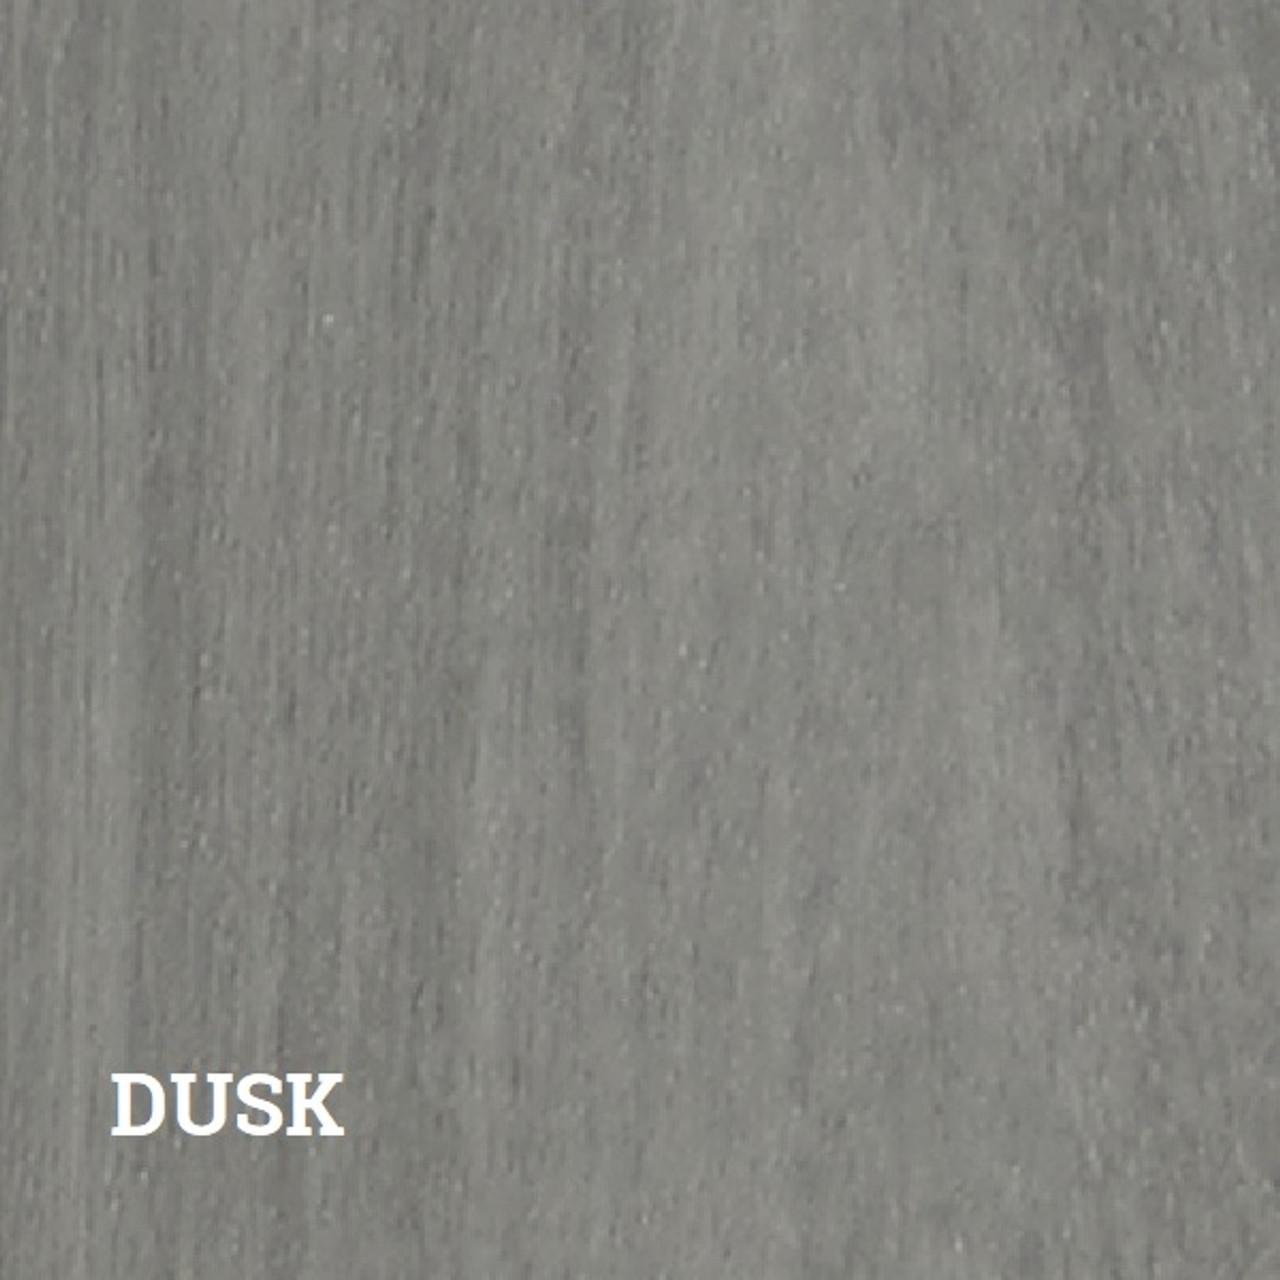 DecKorators Vault Fascia in Dusk